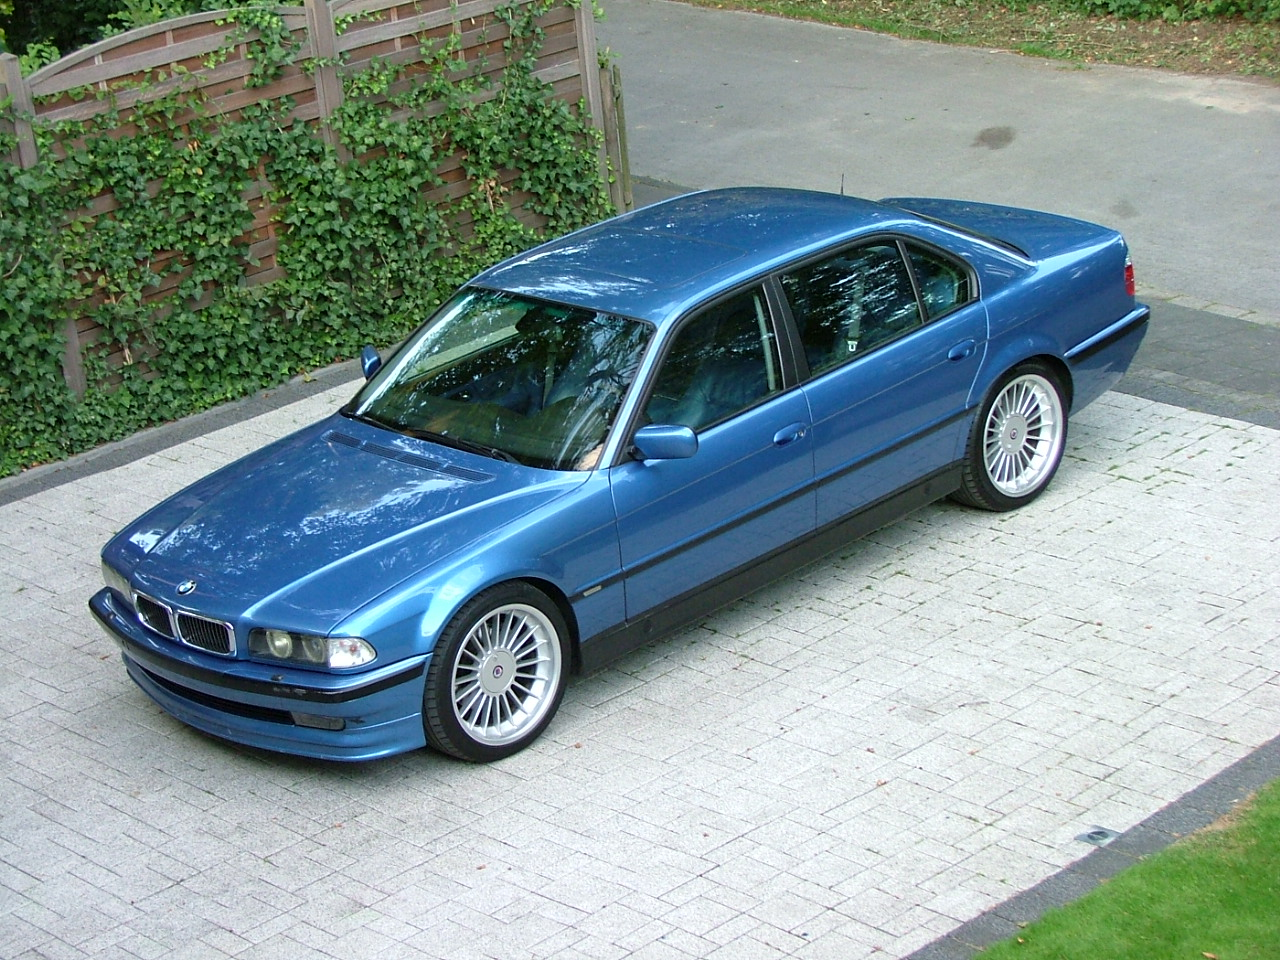 The 2nd Estoril Blue BMW Alpina B12 (5,7) for sale - BMW M5 Forum ...